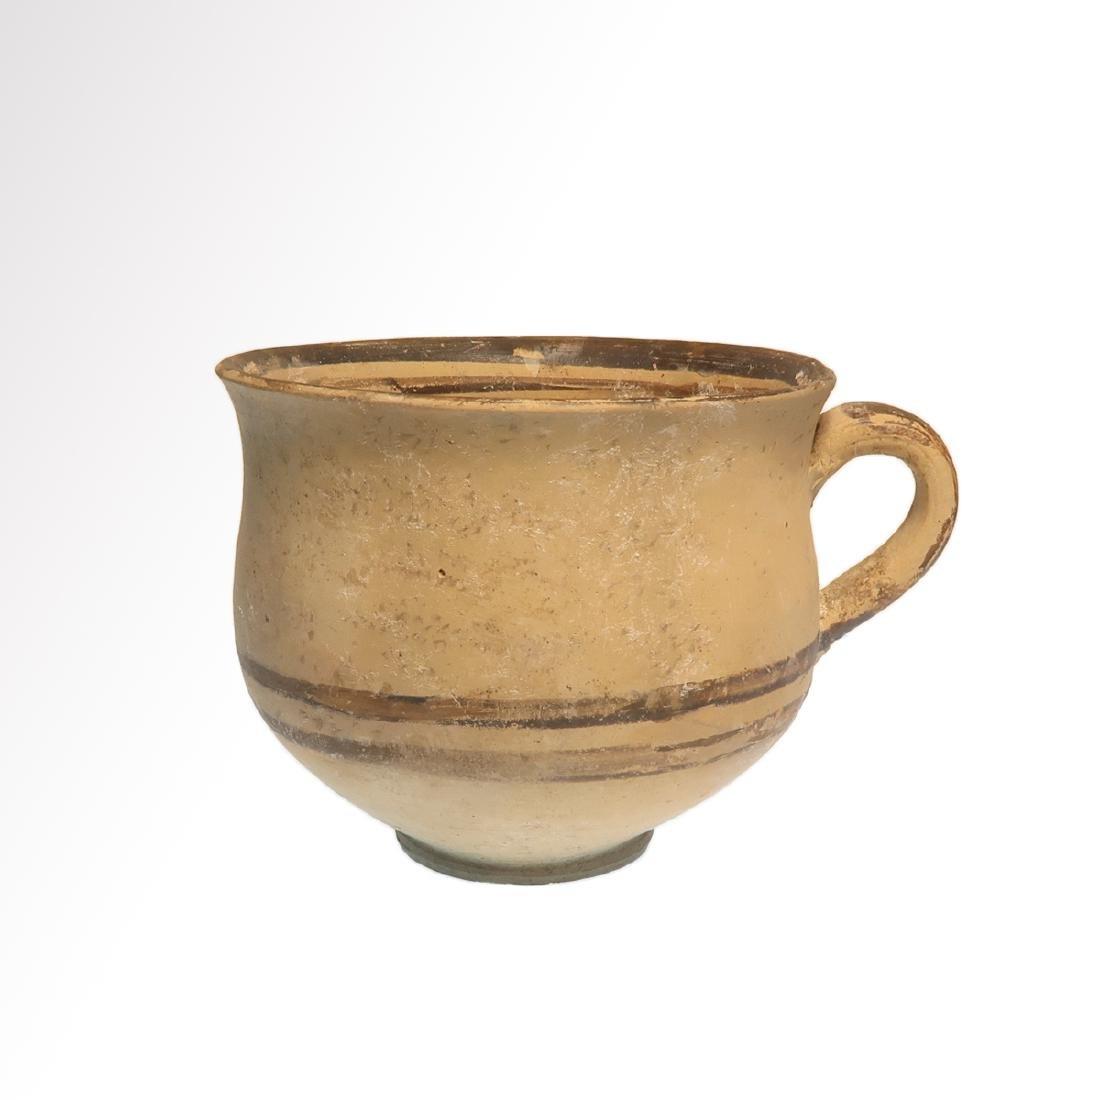 Greek Daunian Cup, c. 4th century B.C.